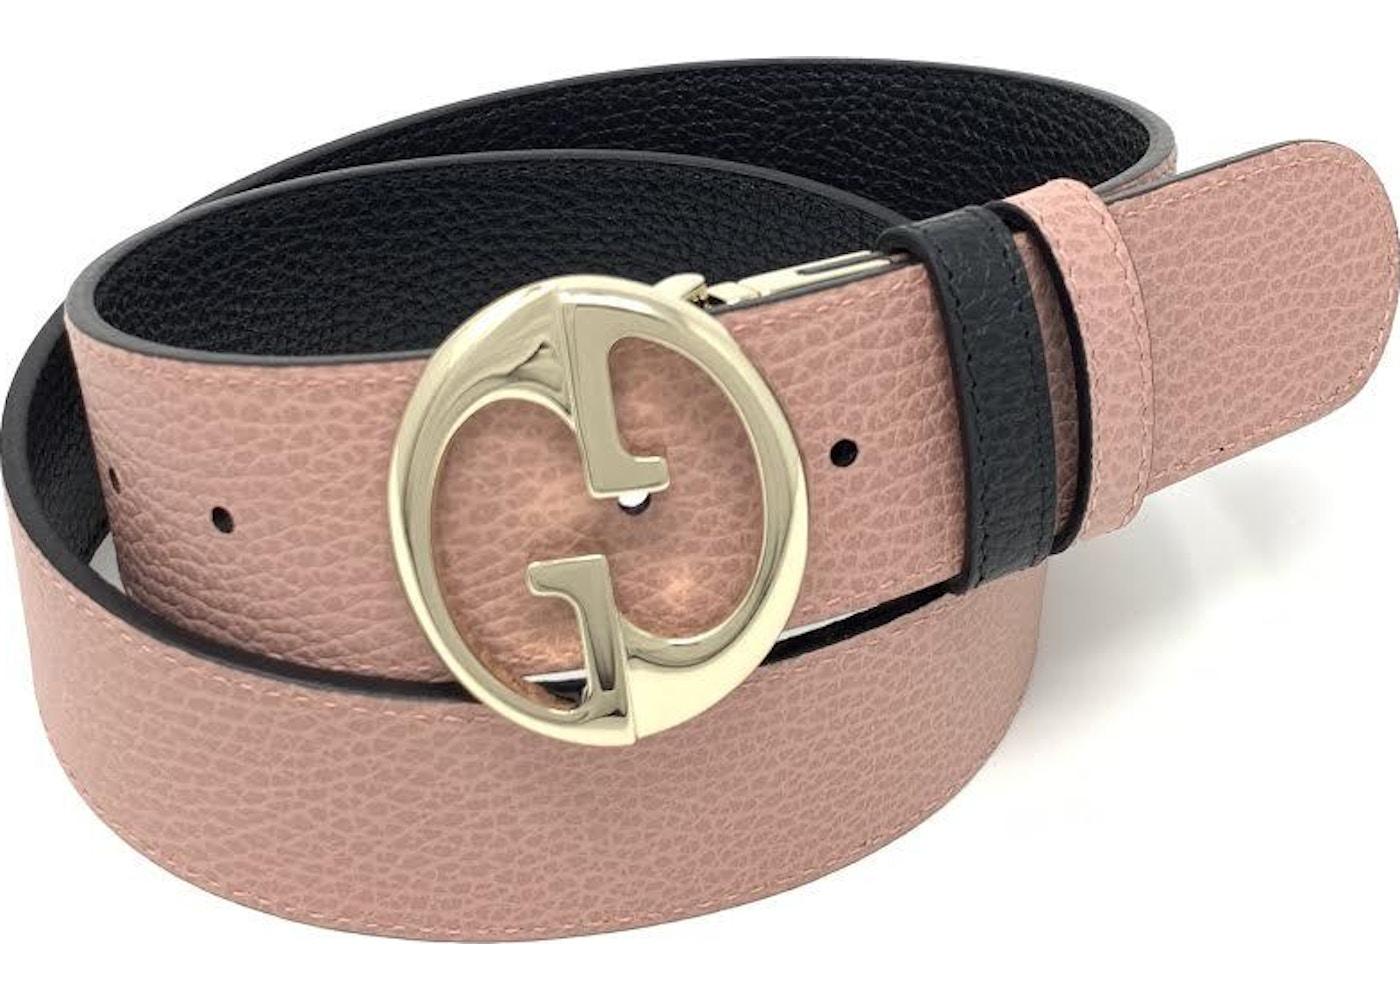 bca82a87a8e Gucci Interlocking G Reversible Belt 1.55W Black Pink. 1.55W Black Pink